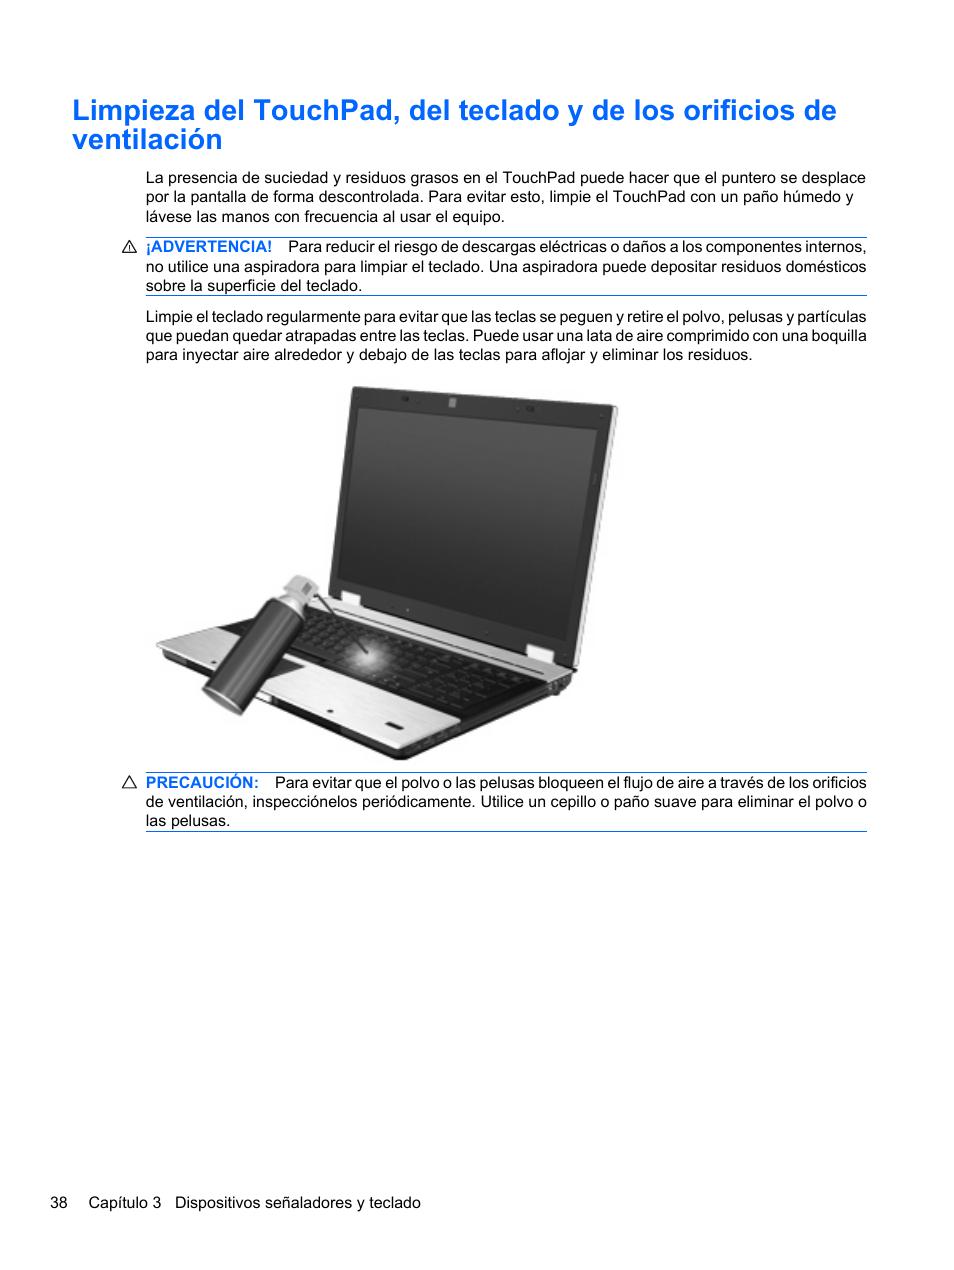 hp elitebook 8740w mobile workstation manual del usuario p gina 50 rh pdfmanuales com HP Wallpaper HP Elite 800